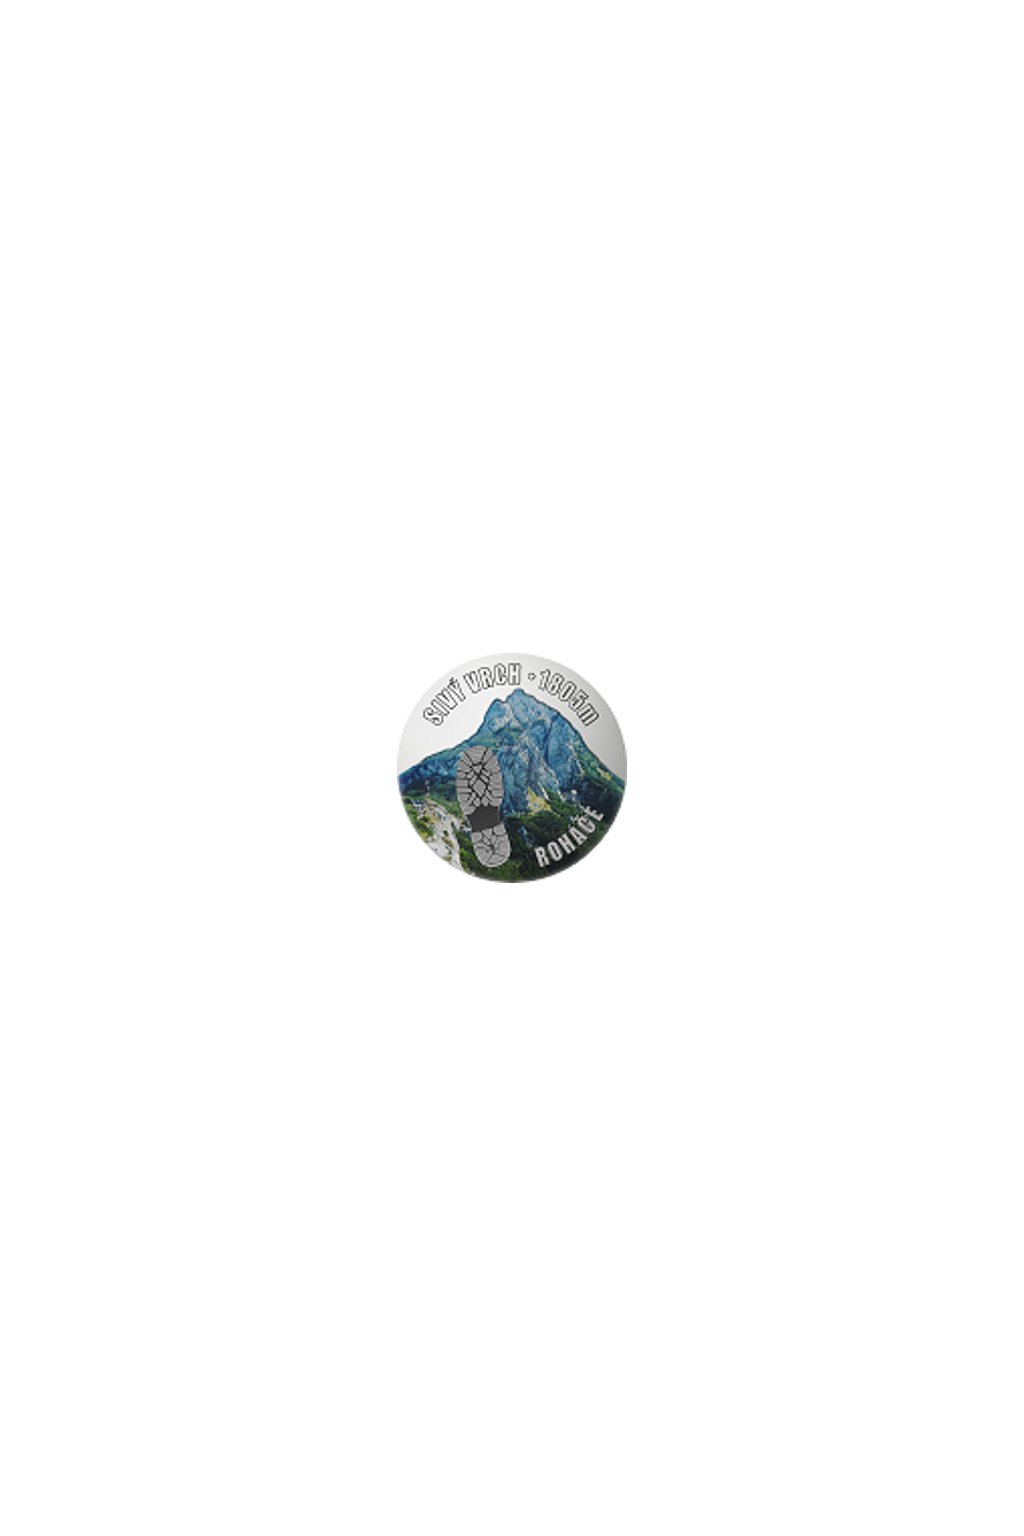 odznak sk sivy vrch